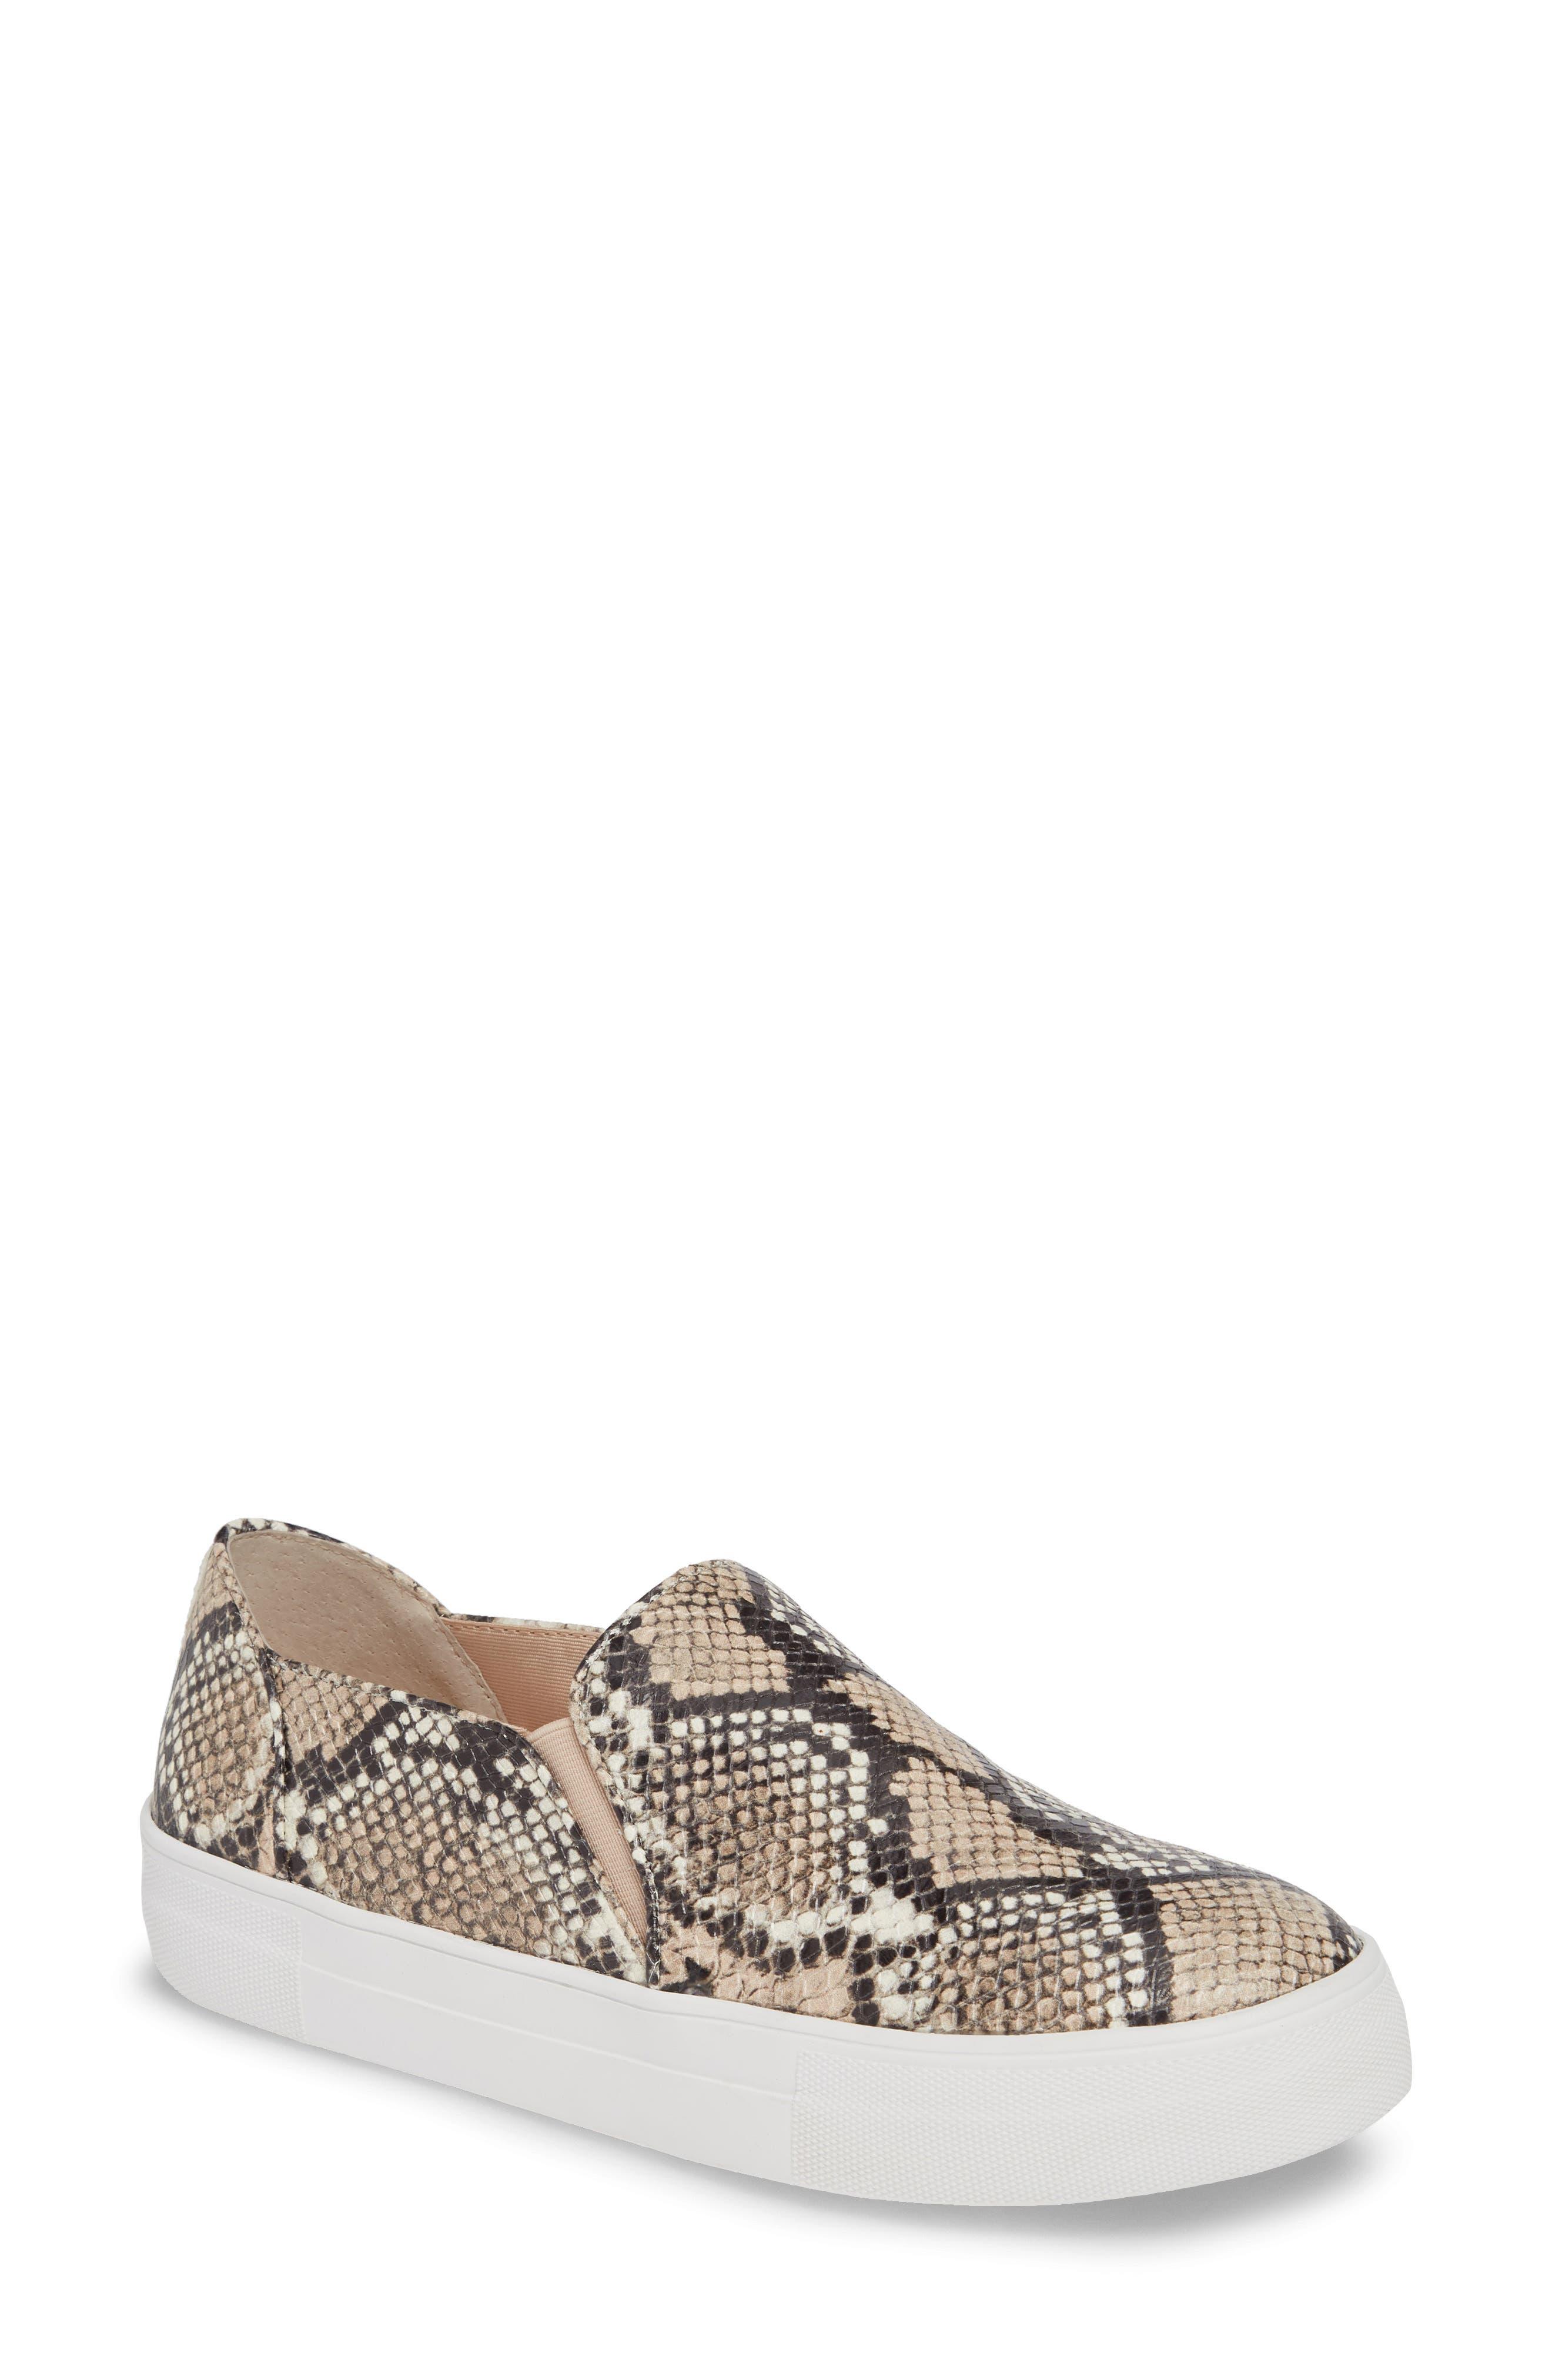 36e5e6ce30f8 Women s Kate Spade New York Sneakers   Running Shoes